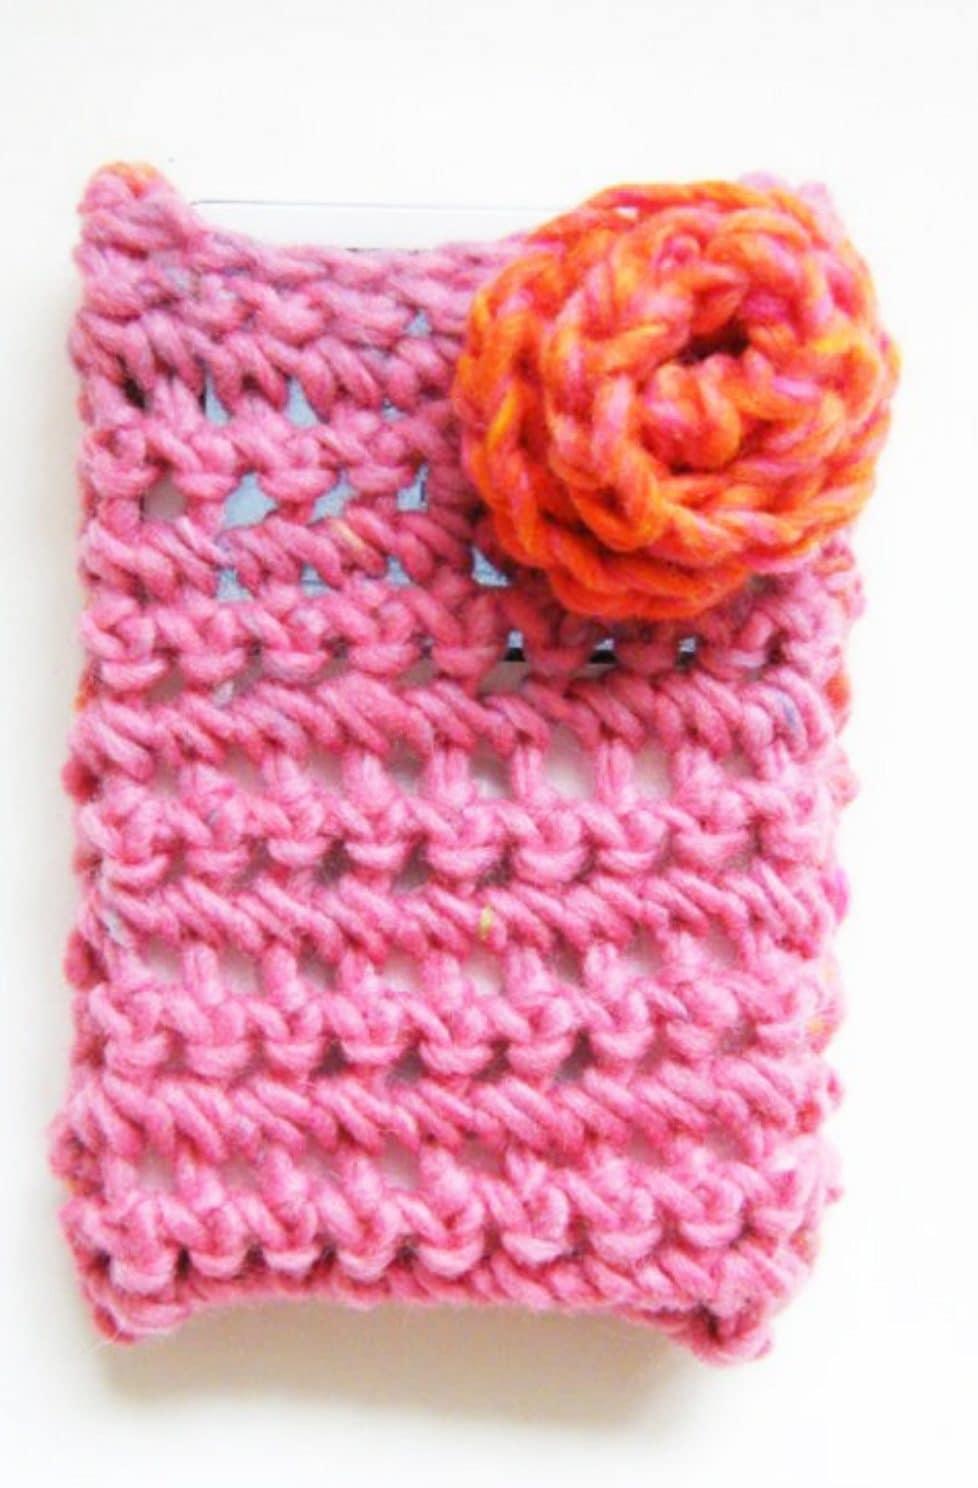 Crochet gadget cosy